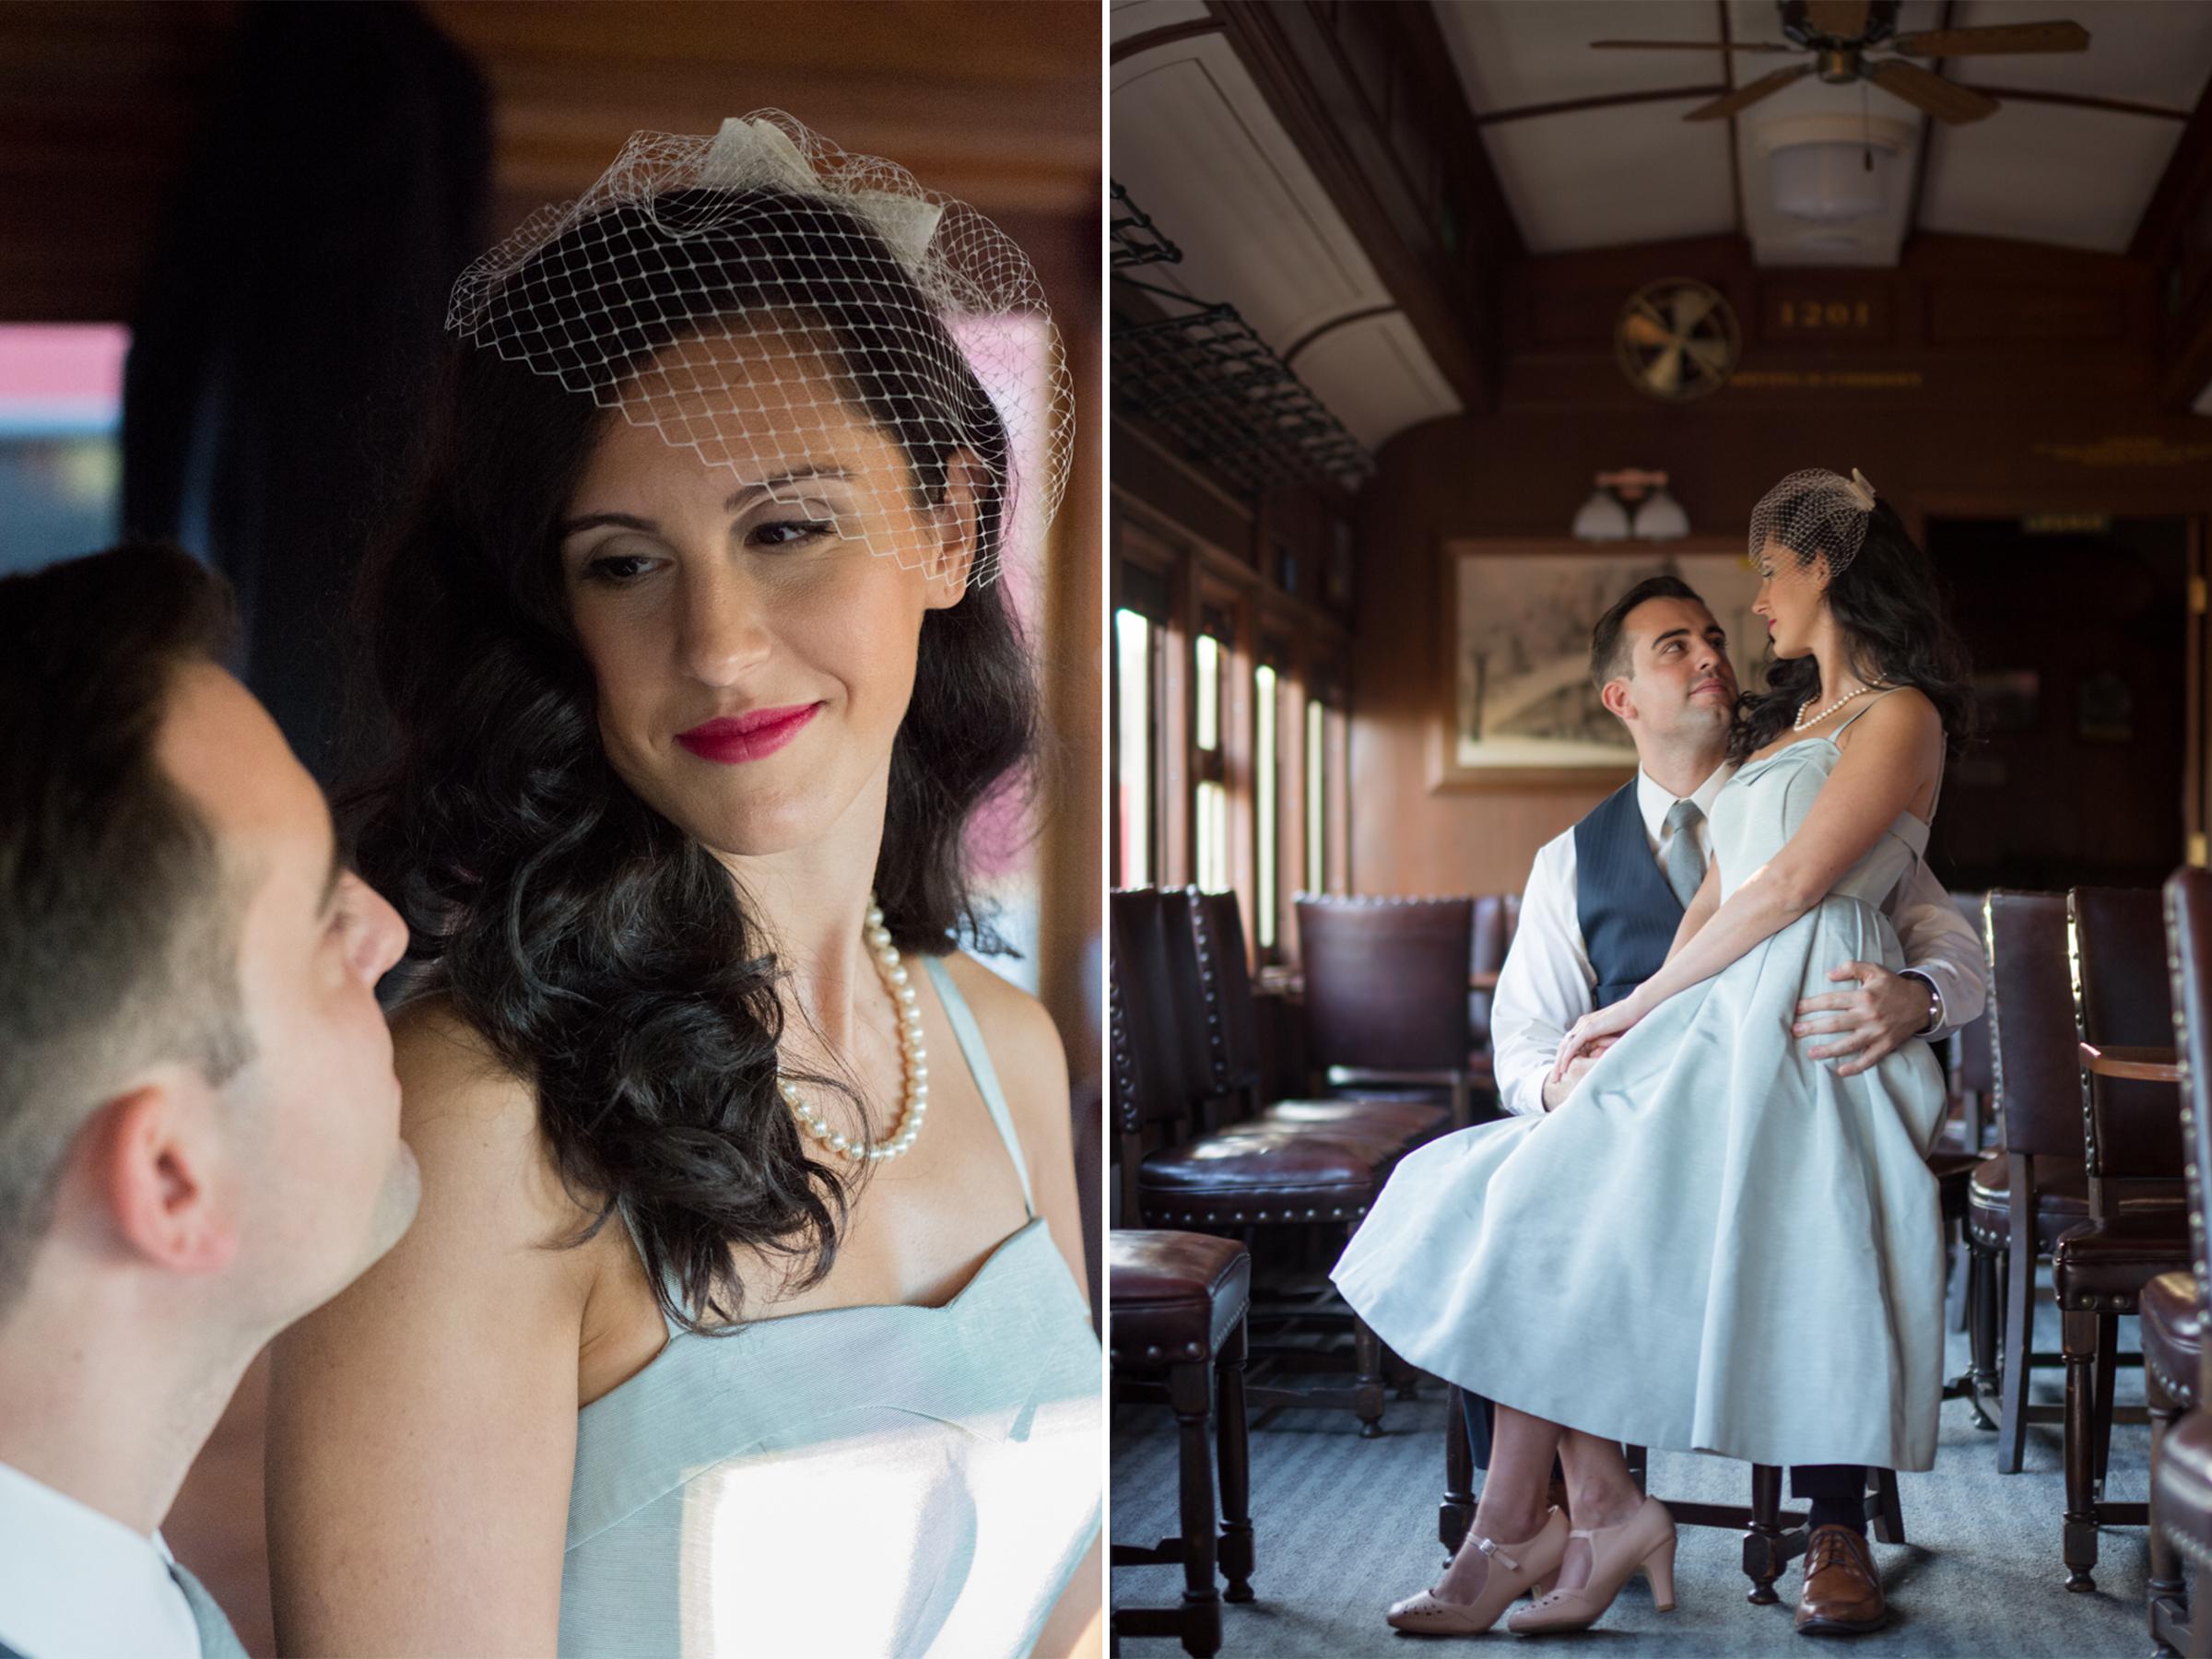 M+J Engagement Photos 4- Whippany Railway Museum- New Jersey -Olivia Christina Photography.jpg